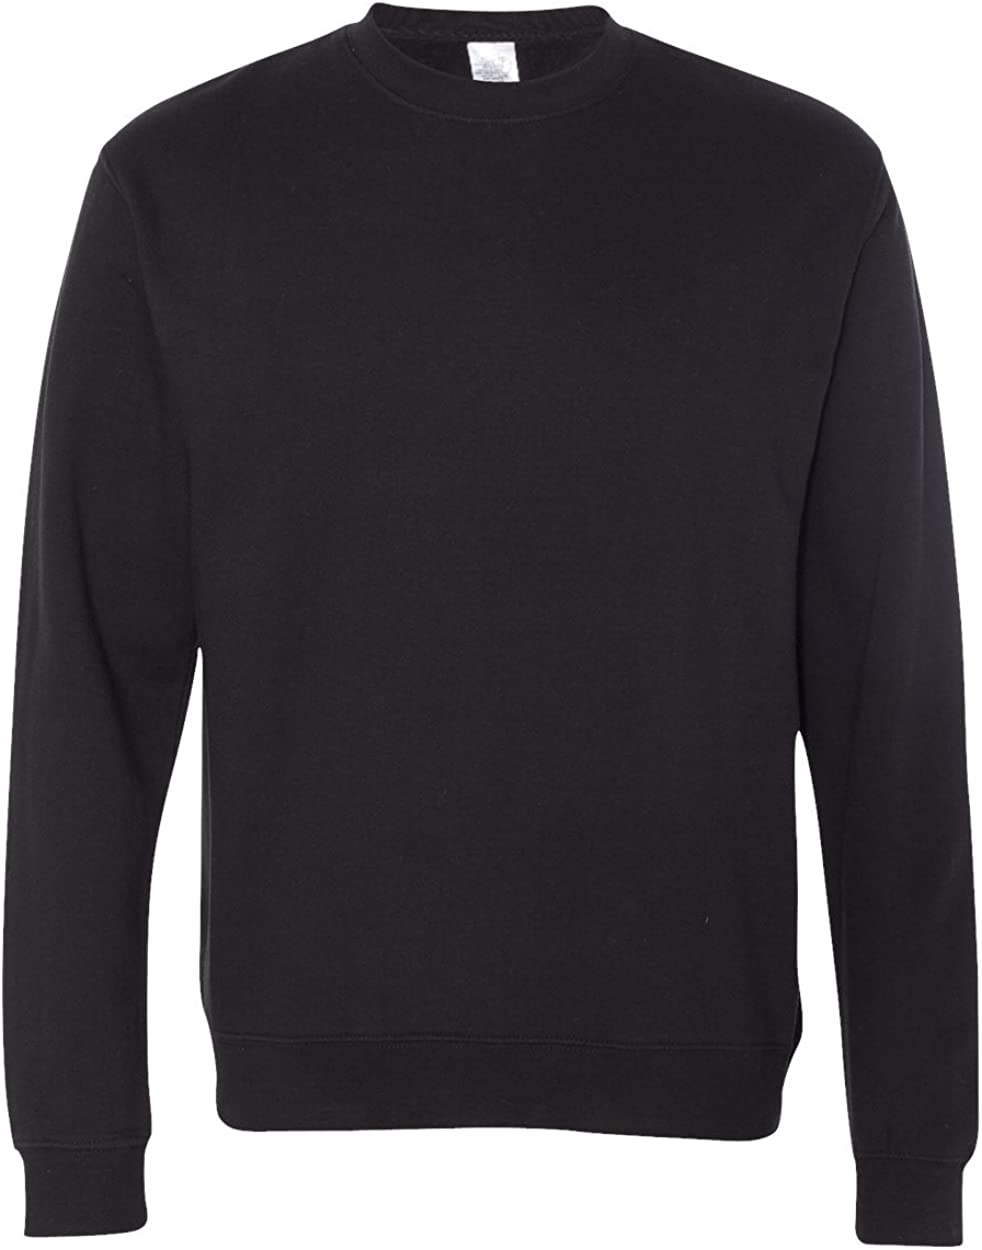 SS3000 Independent Trading Co Crewneck Sweatshirt